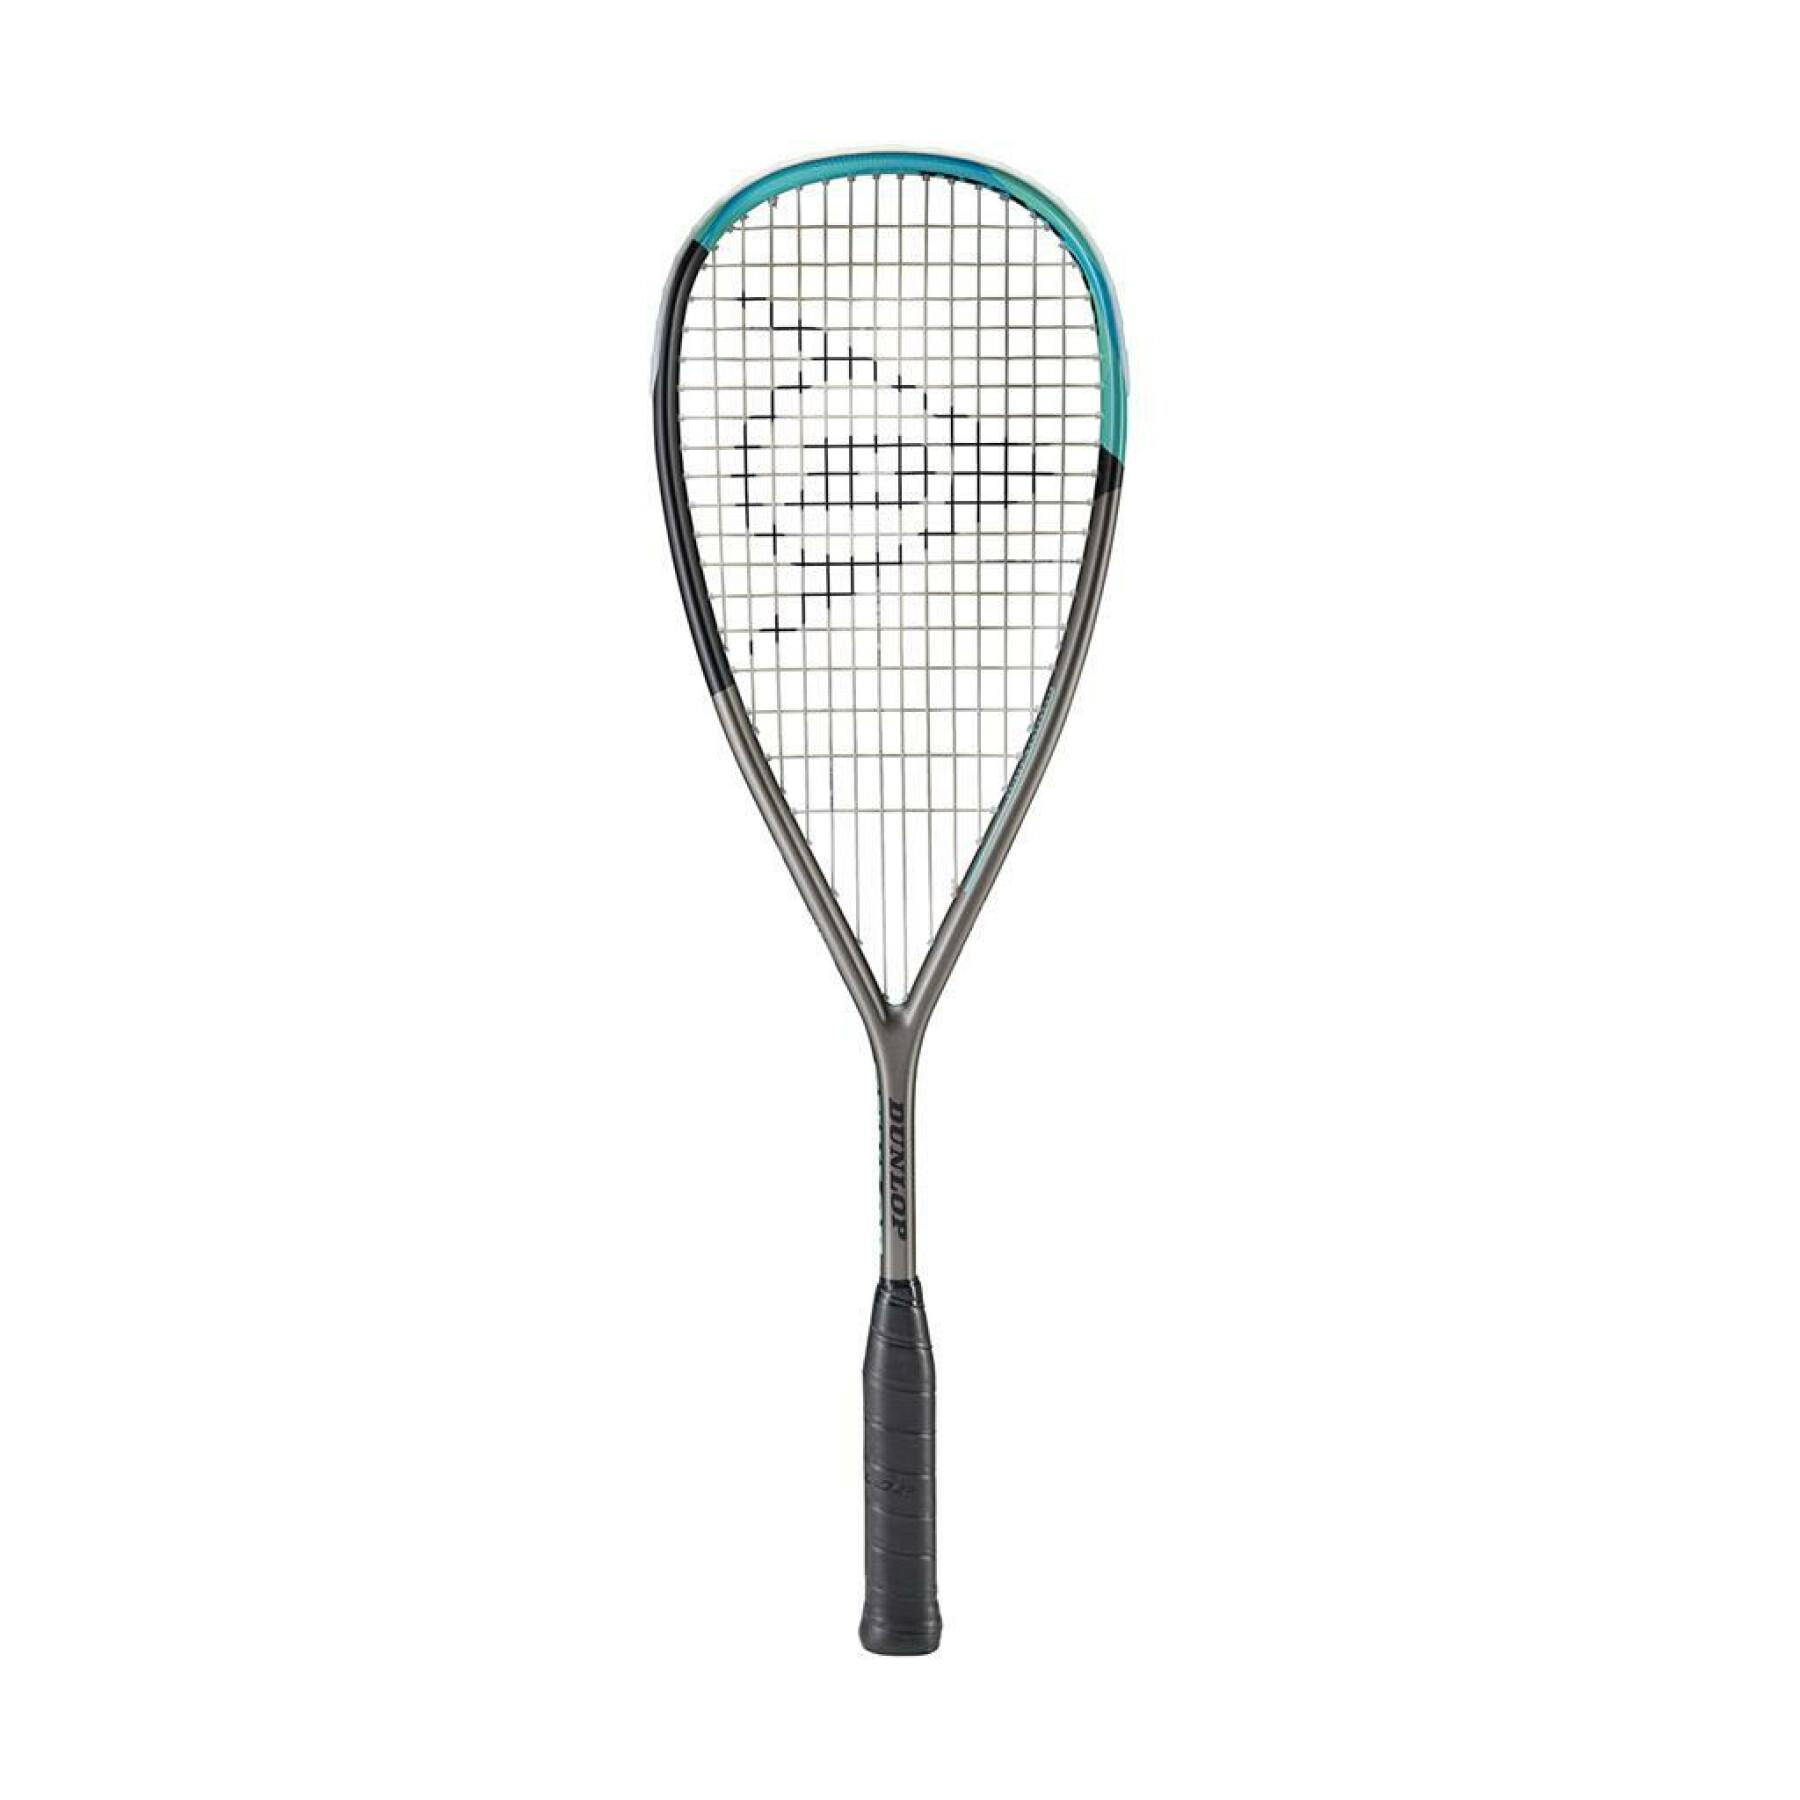 Racket Dunlop storm titanium sls